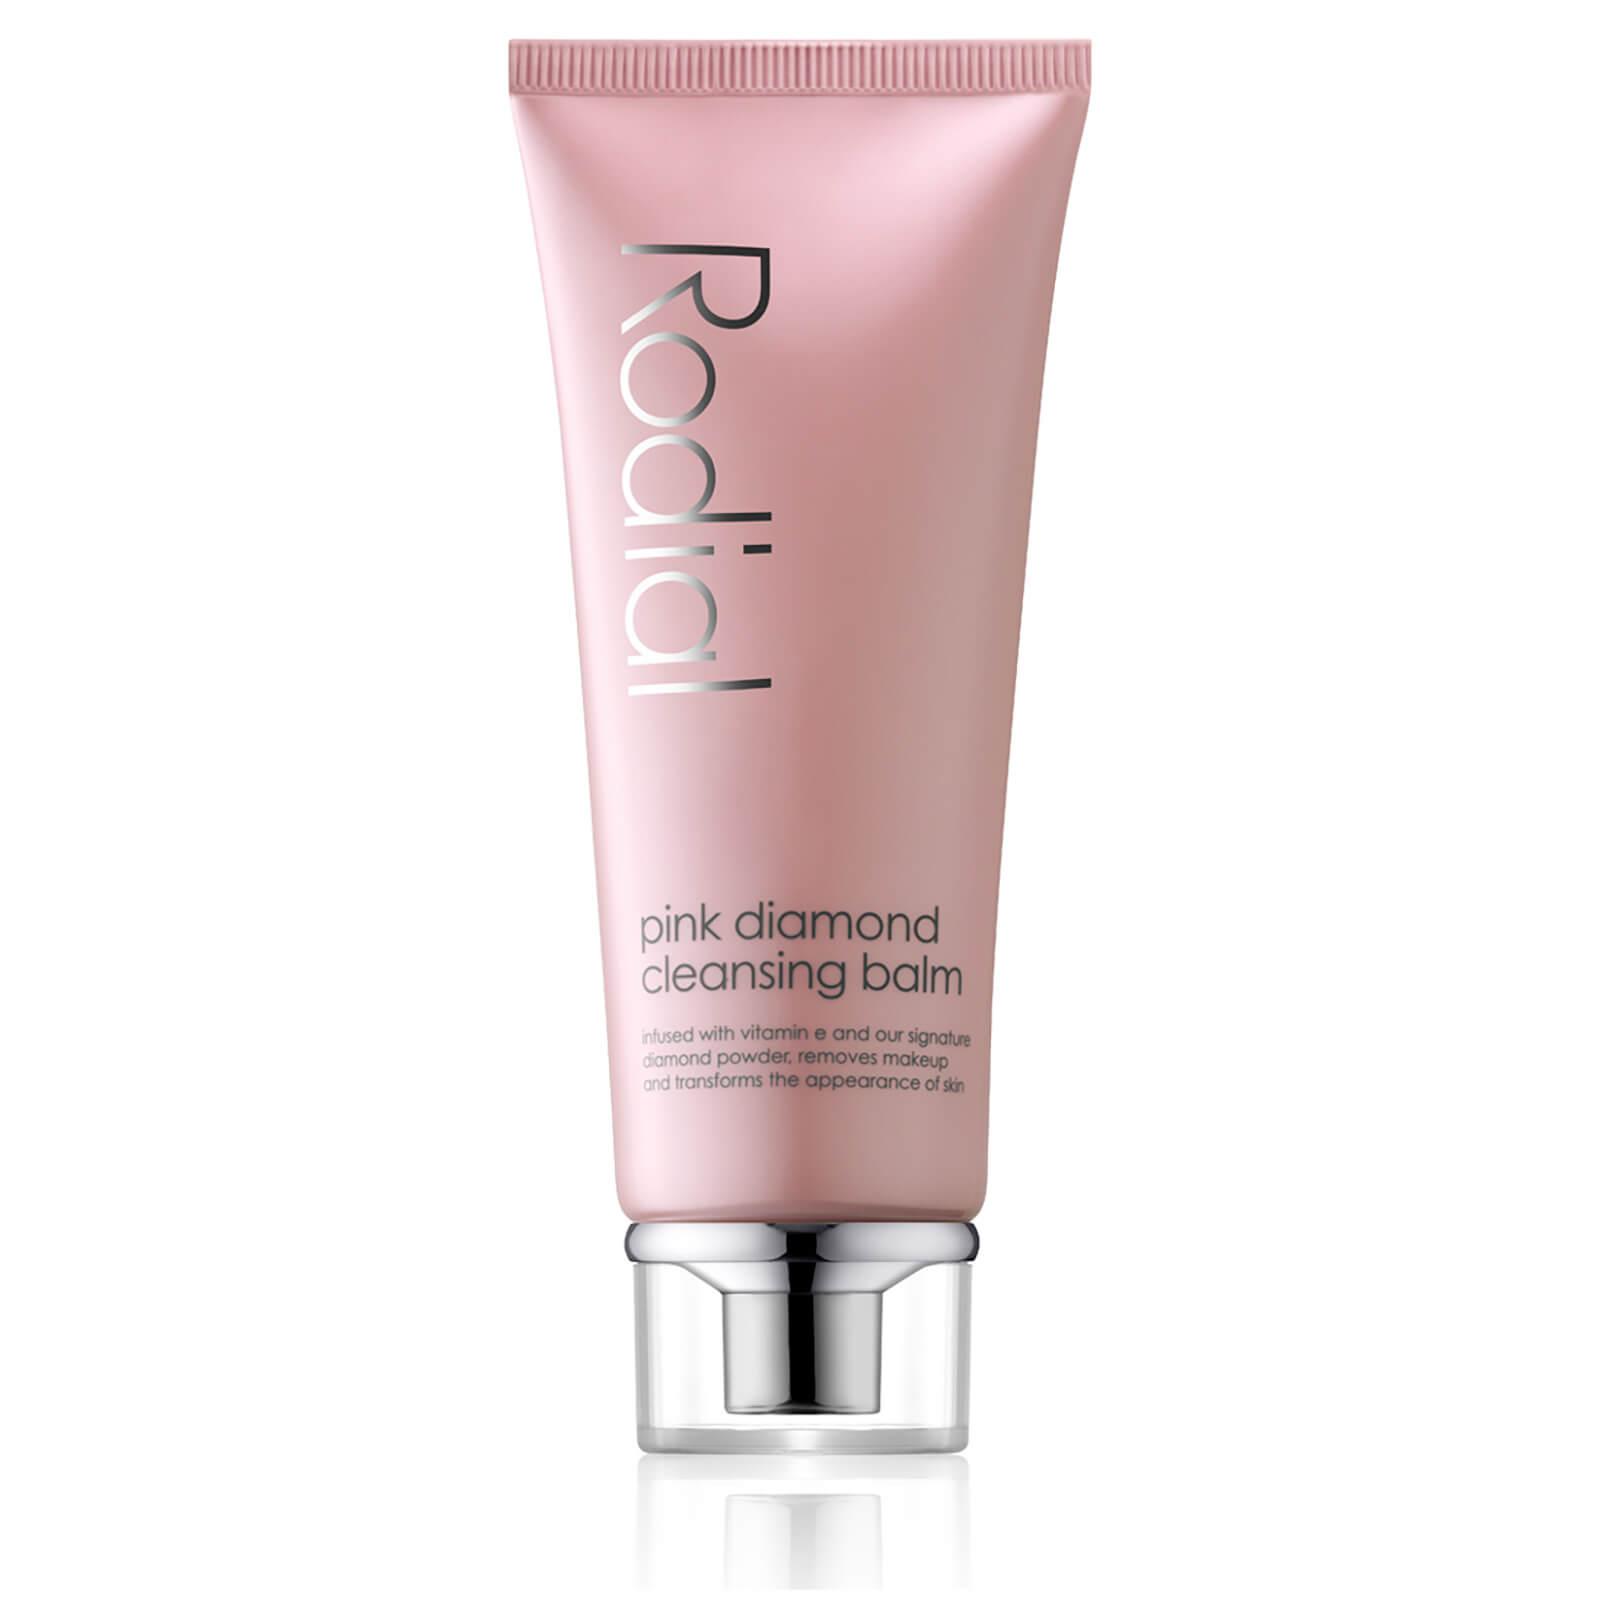 Купить Rodial Pink Diamond Cleansing Balm 100ml